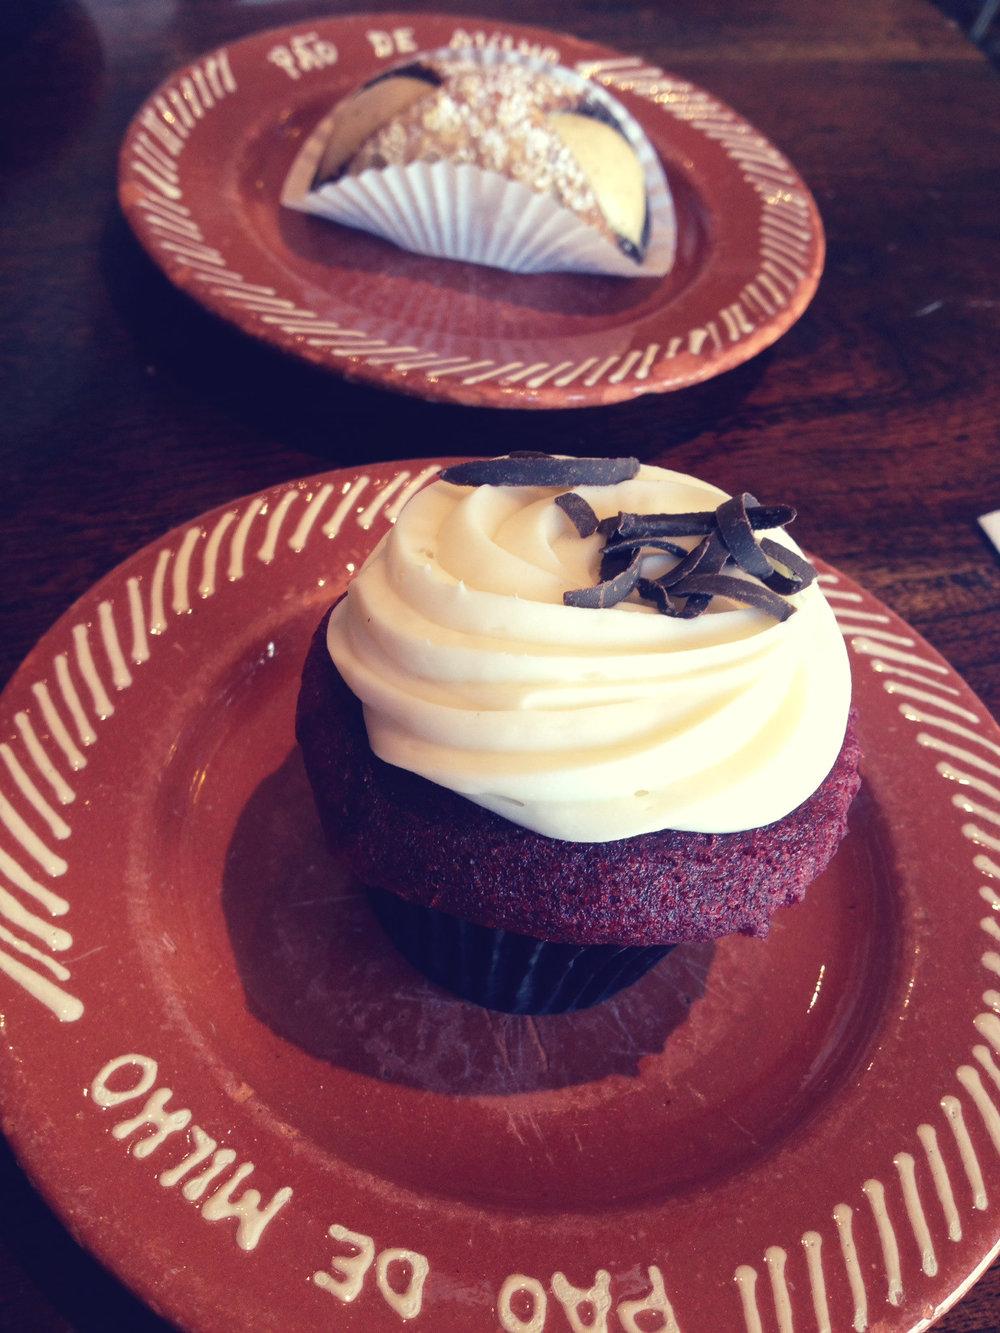 Cupcake and cannoli